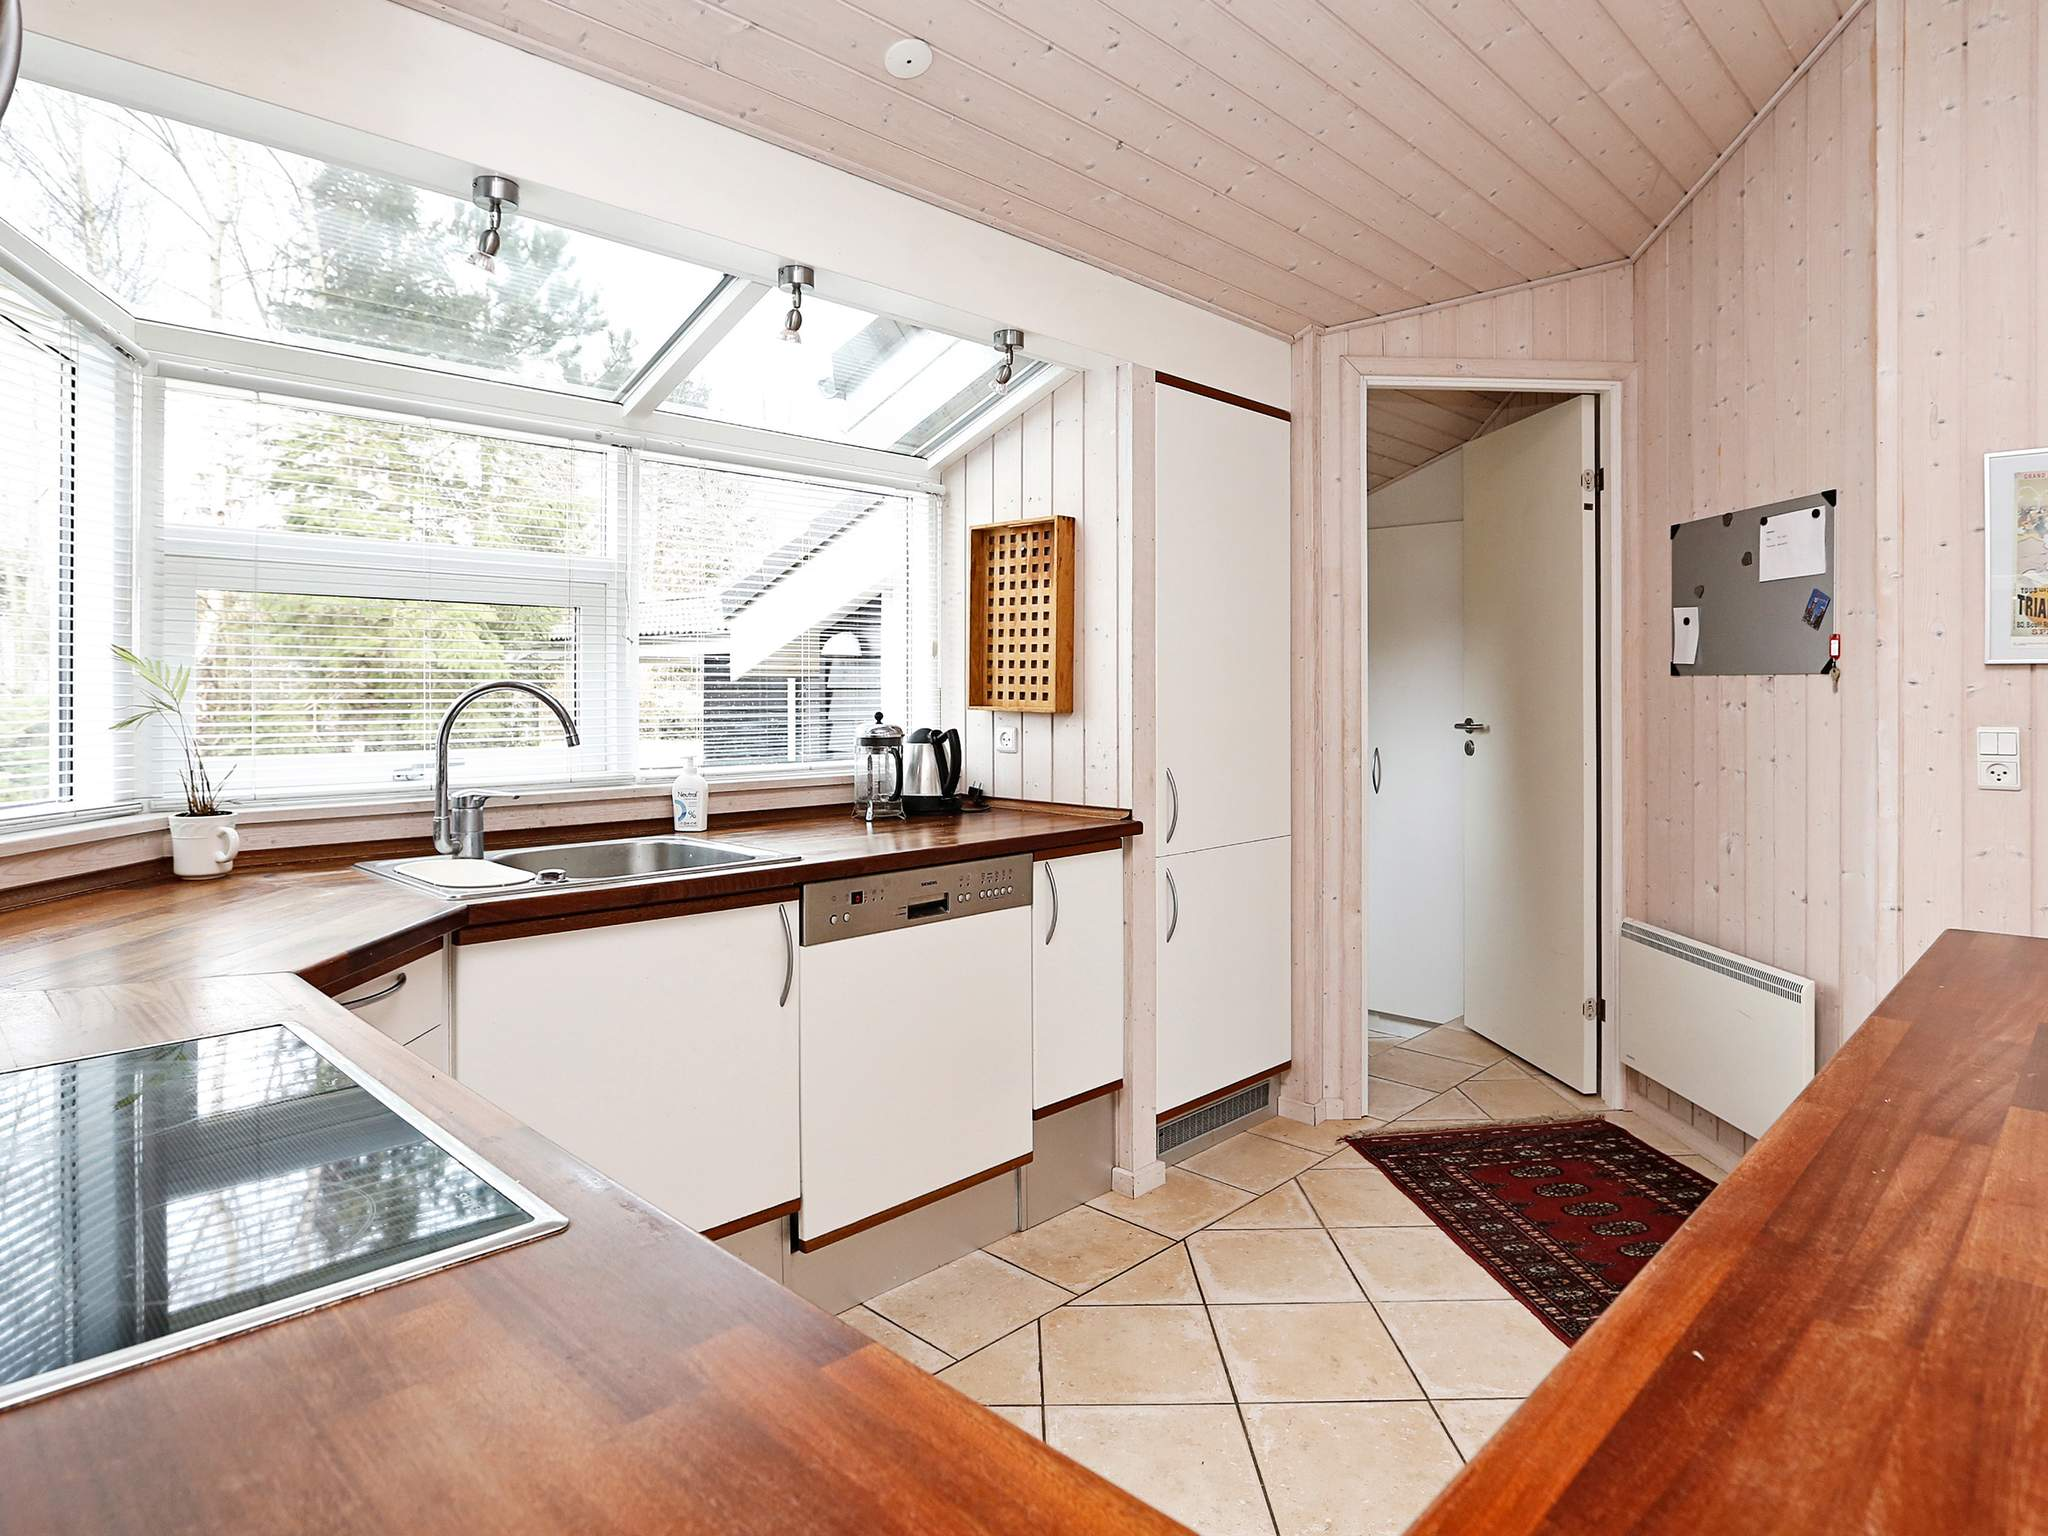 Maison de vacances Skibby (124927), Kirke Hyllinge, , Seeland Nord, Danemark, image 7